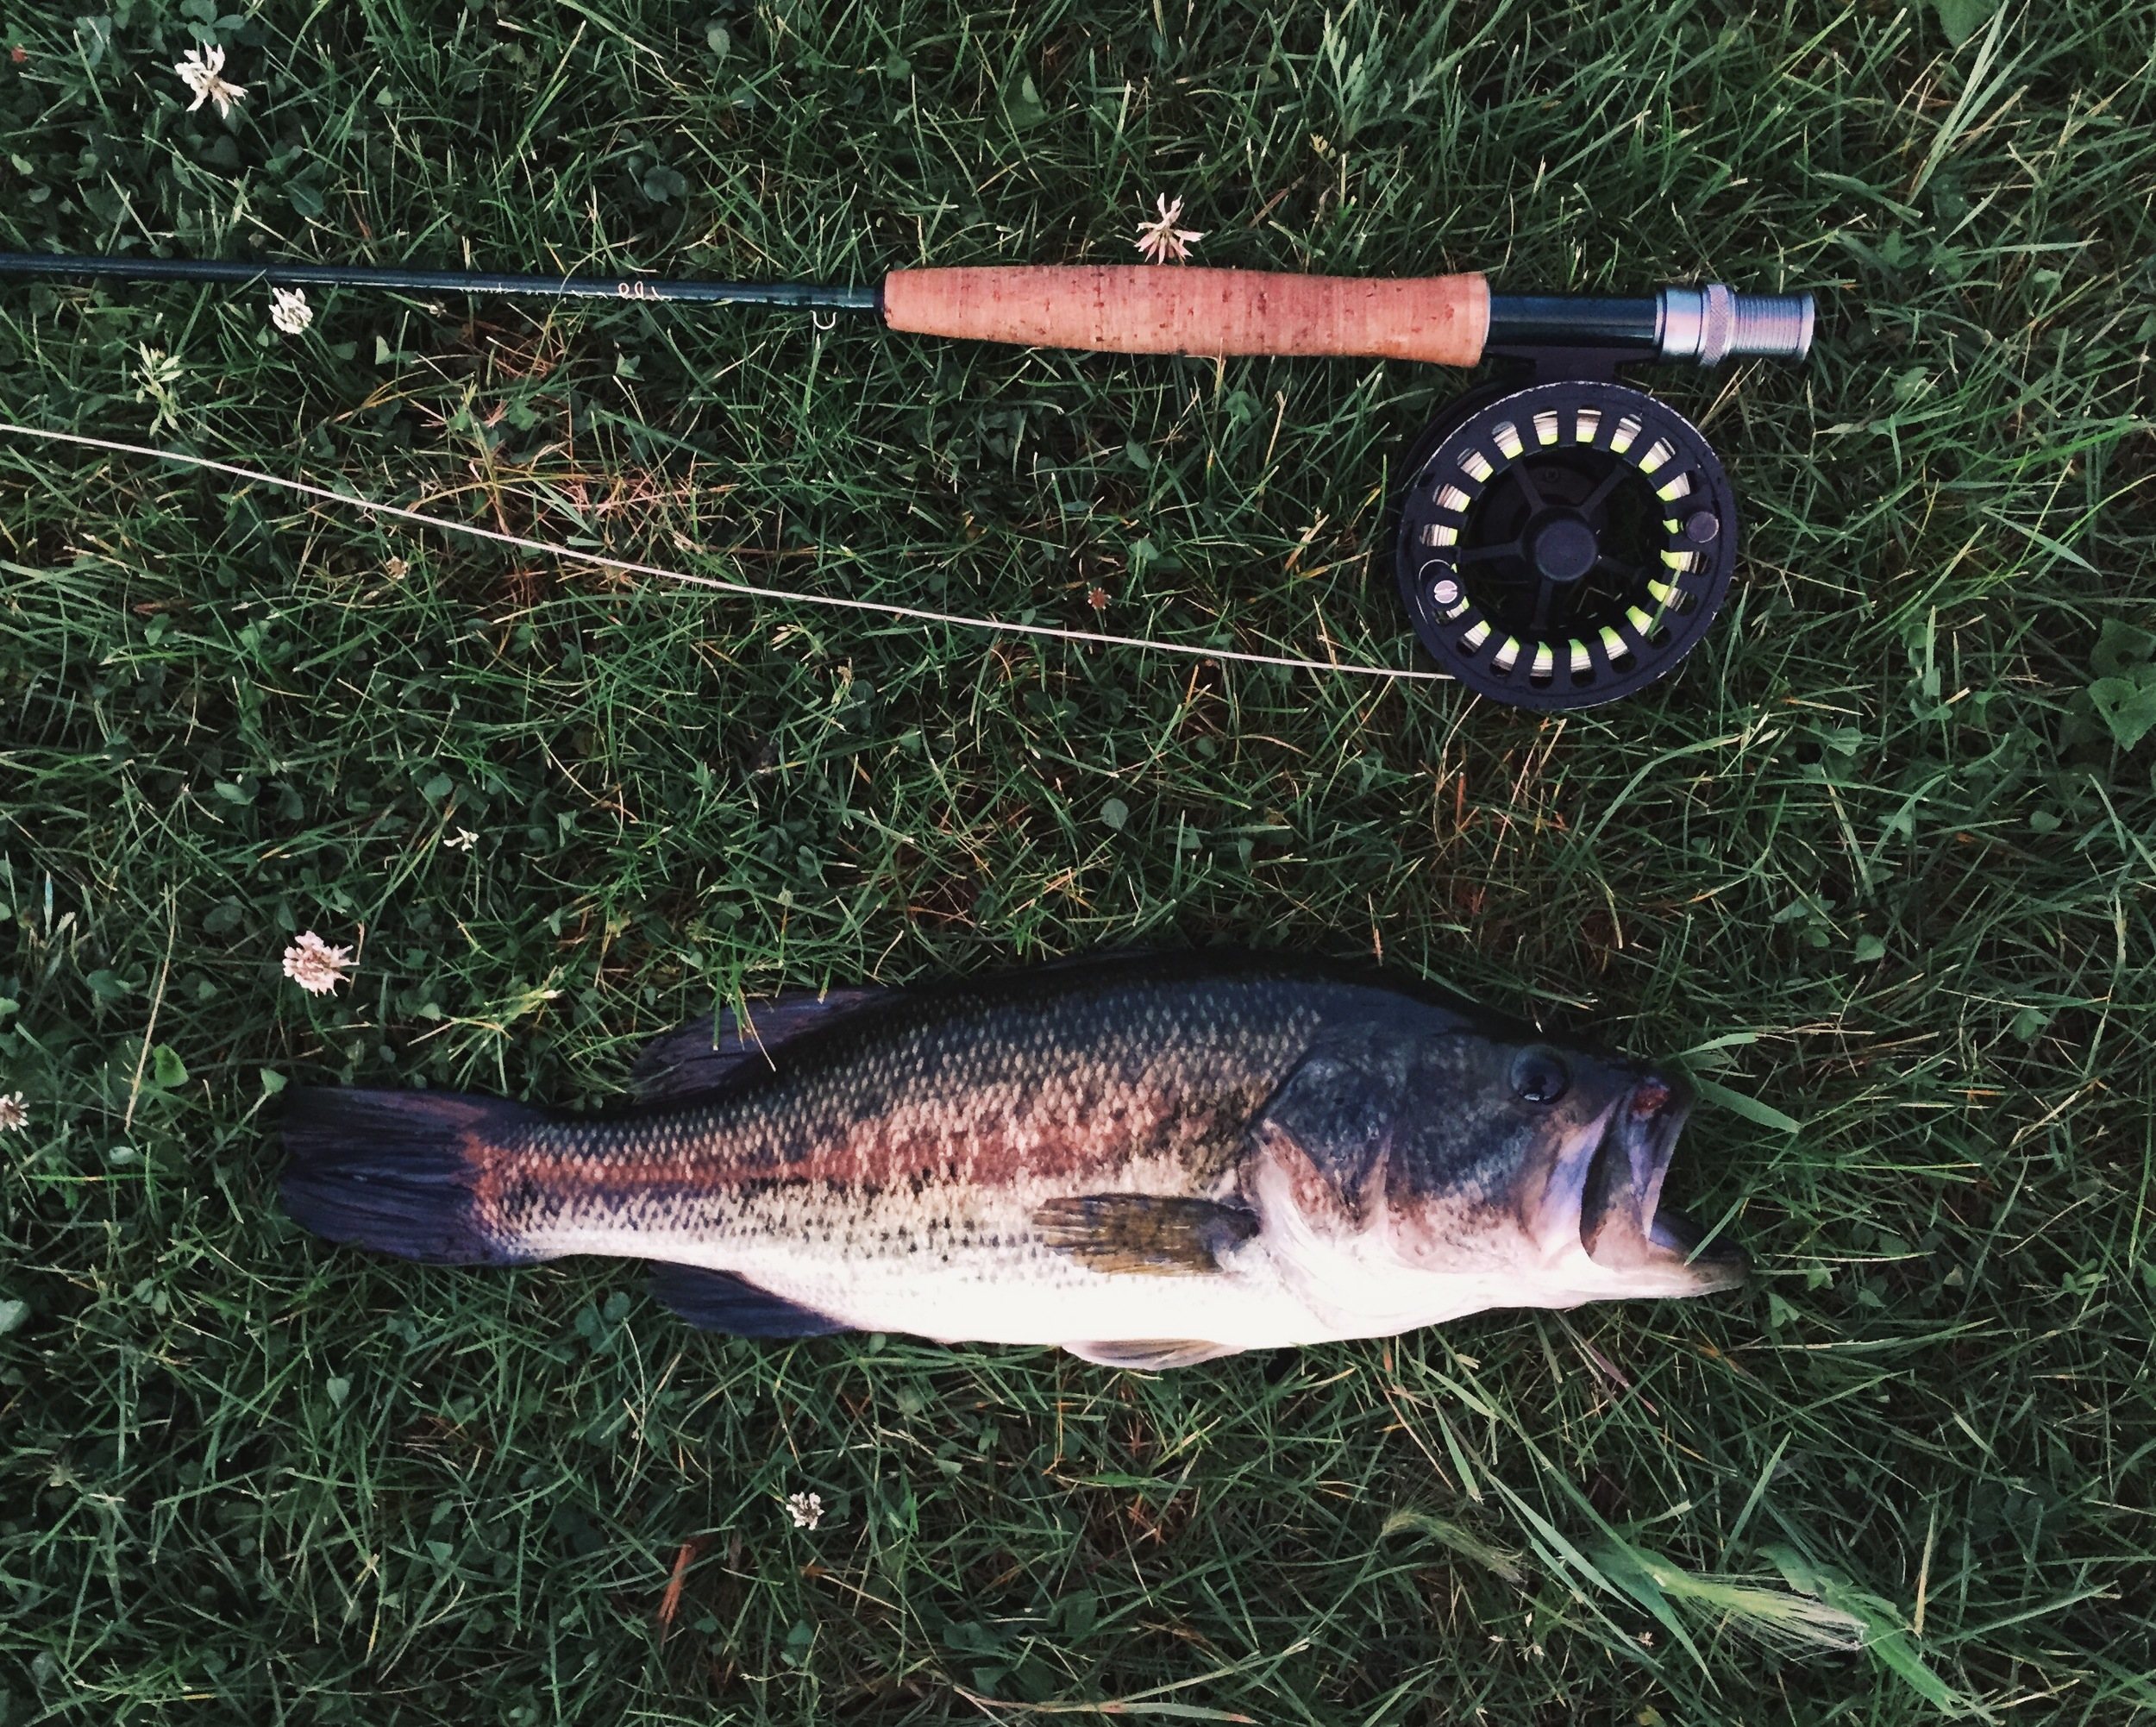 ankeny-fly-fishing-biggest-bass-sofar